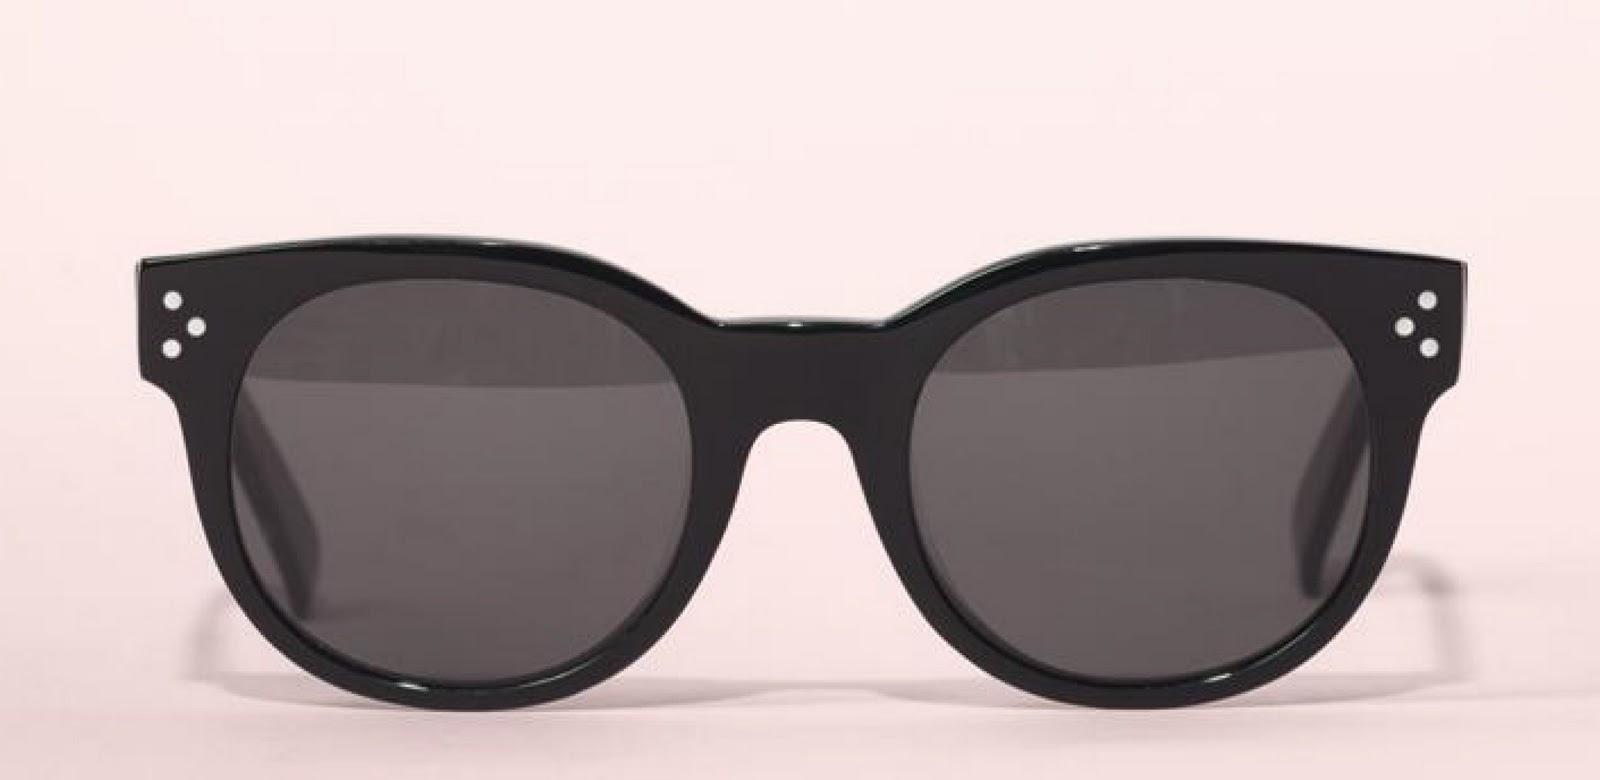 http://1.bp.blogspot.com/_m5u9mNBBNAc/TM7i2isEDfI/AAAAAAAAAqI/vqJ8E_UkFX0/s1600/Celine%20audrey%20small%20sunglasses.jpg